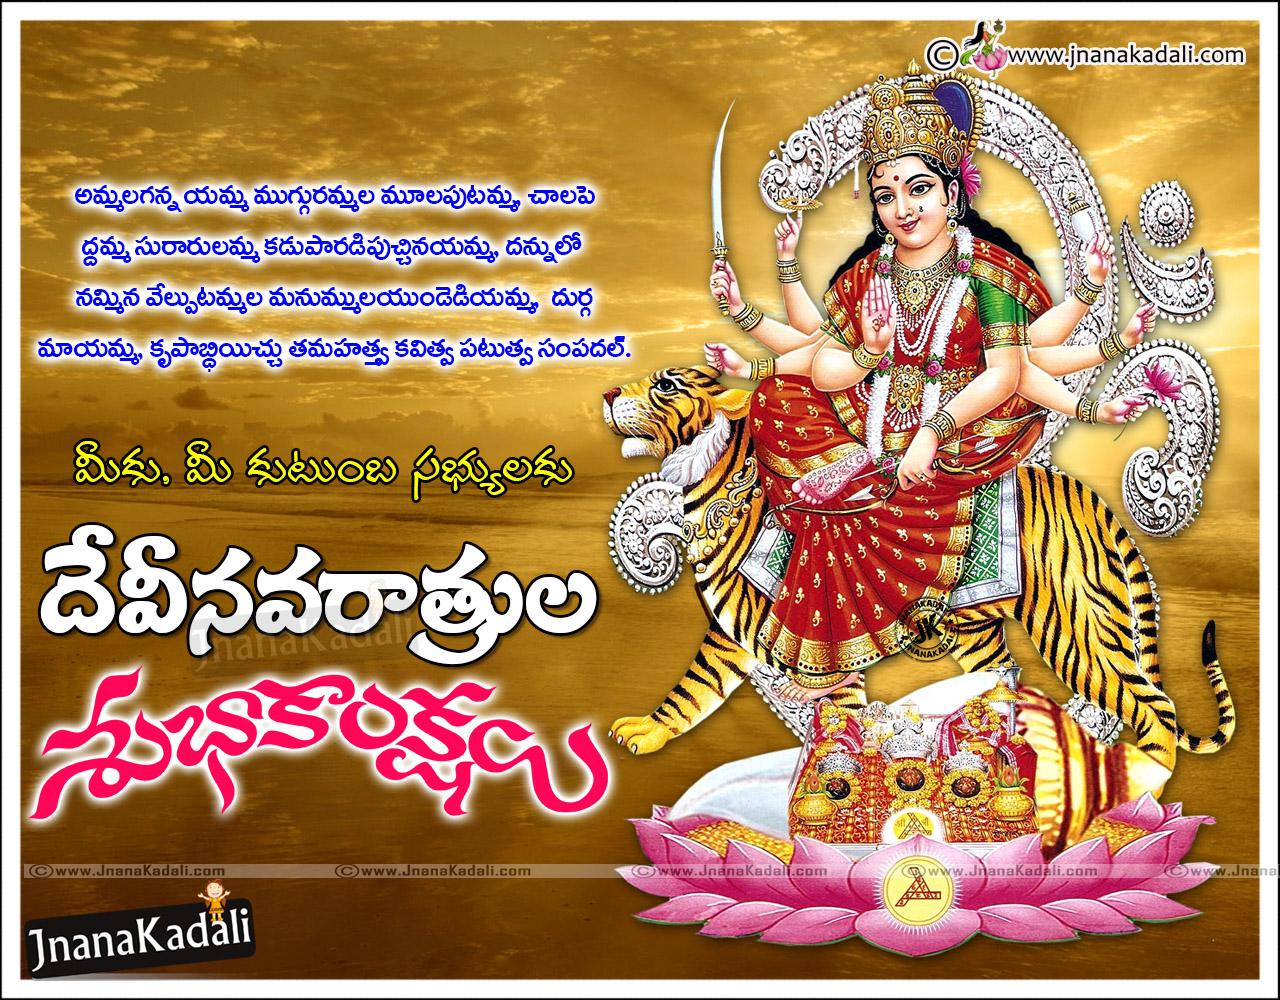 Top telugu good dasara festival prayer images aayudha pooja telugu here is vijaya dashami subhakankshalu telugudasara subhakankshalu telugu imagesvijayadasami subhakankshalu telugu images m4hsunfo